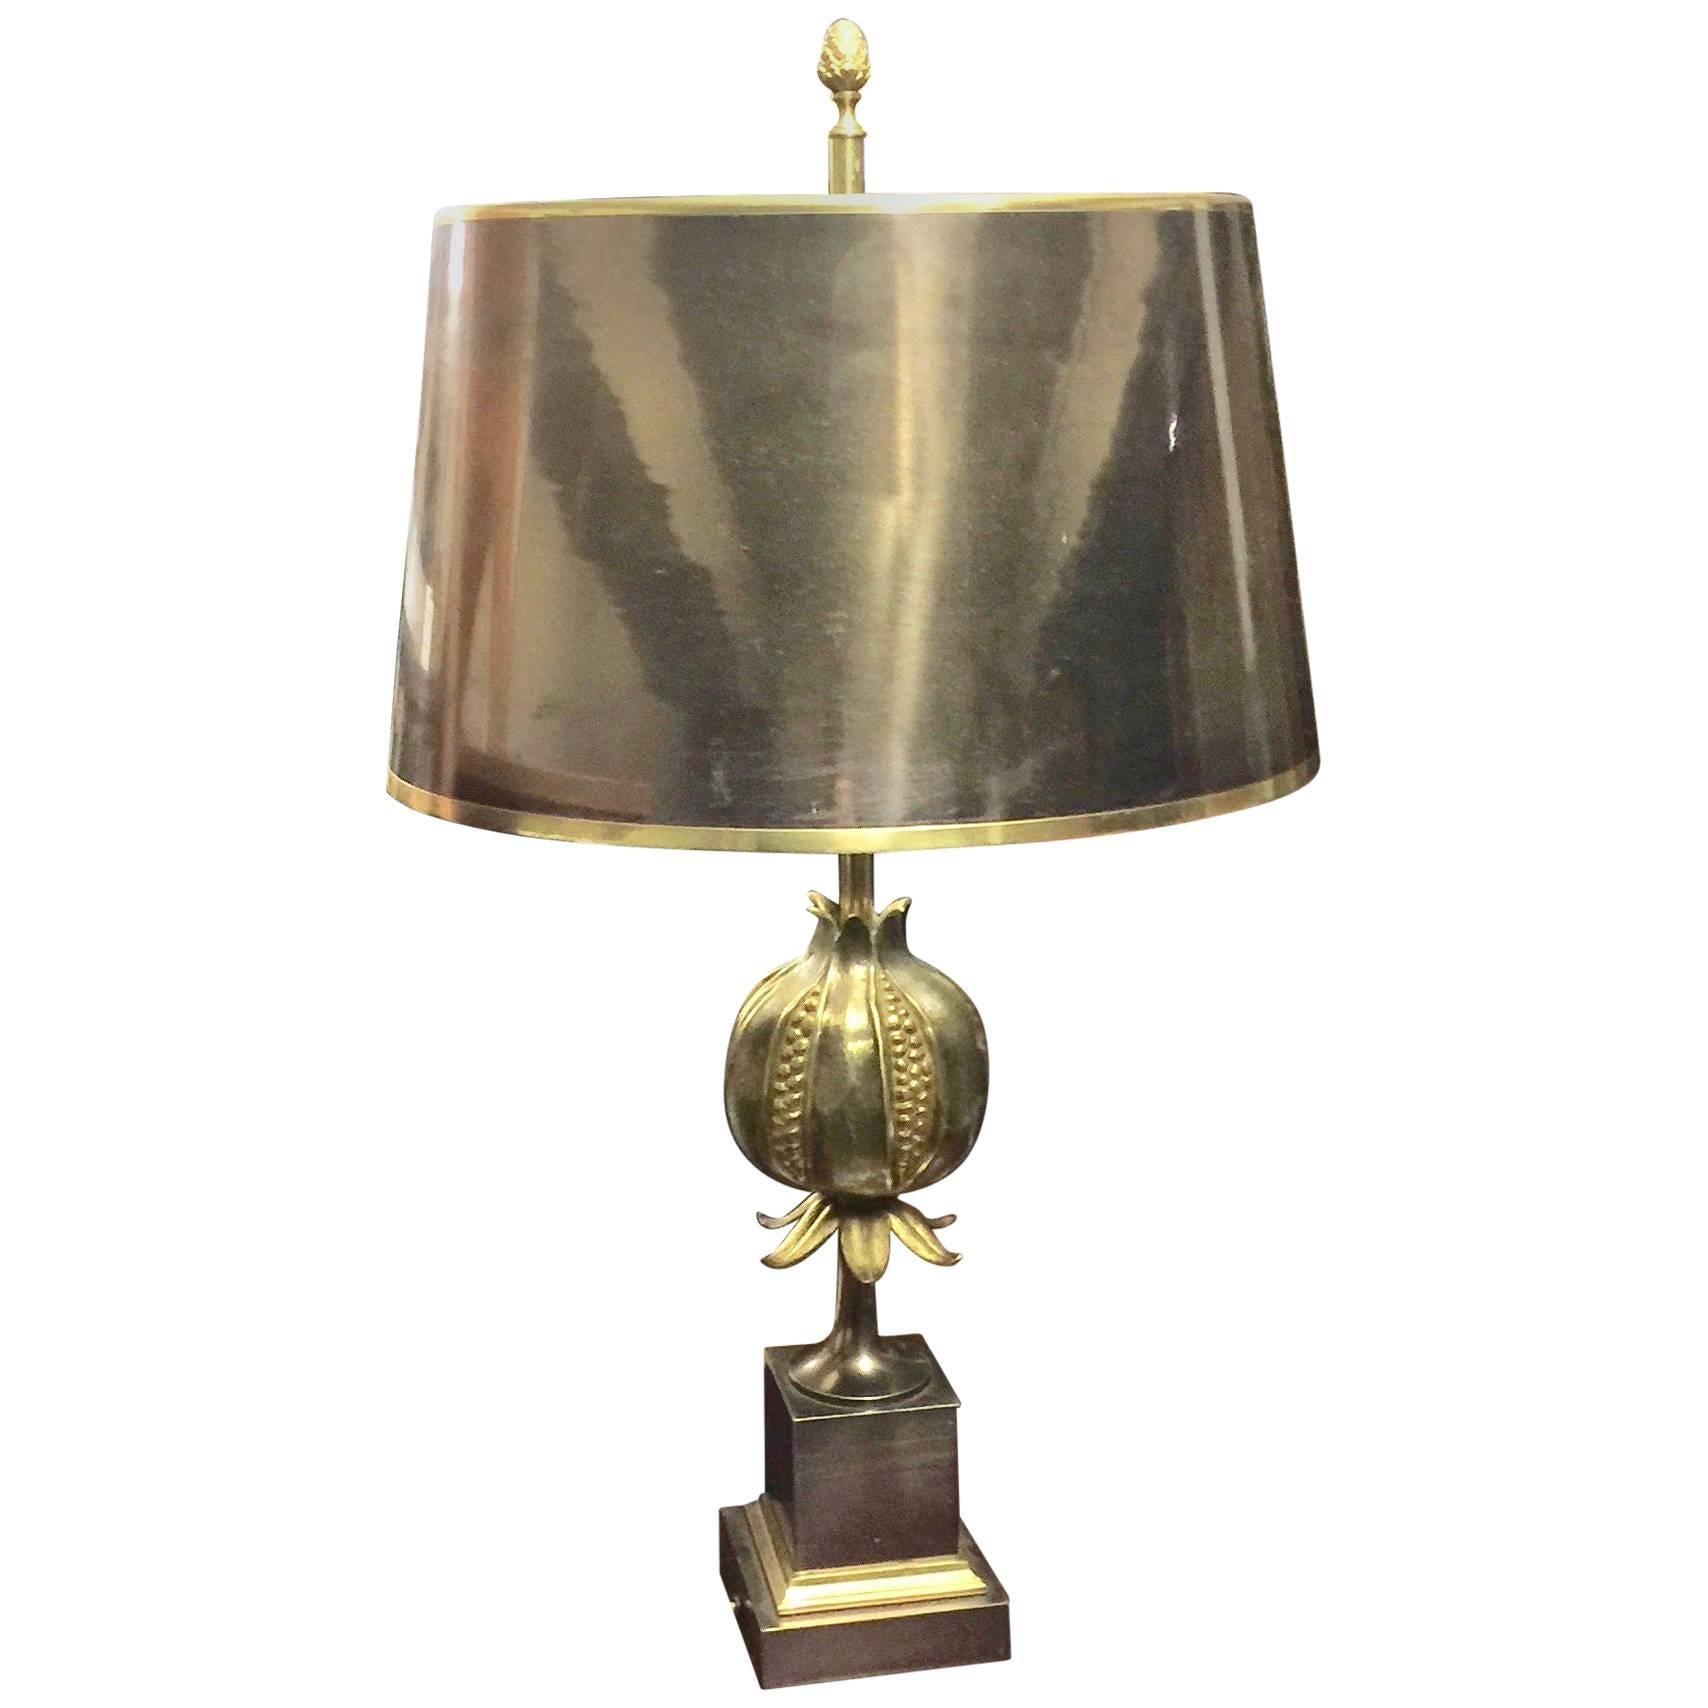 Maison Charles Pomegranate Bronze Table Lamp Signed